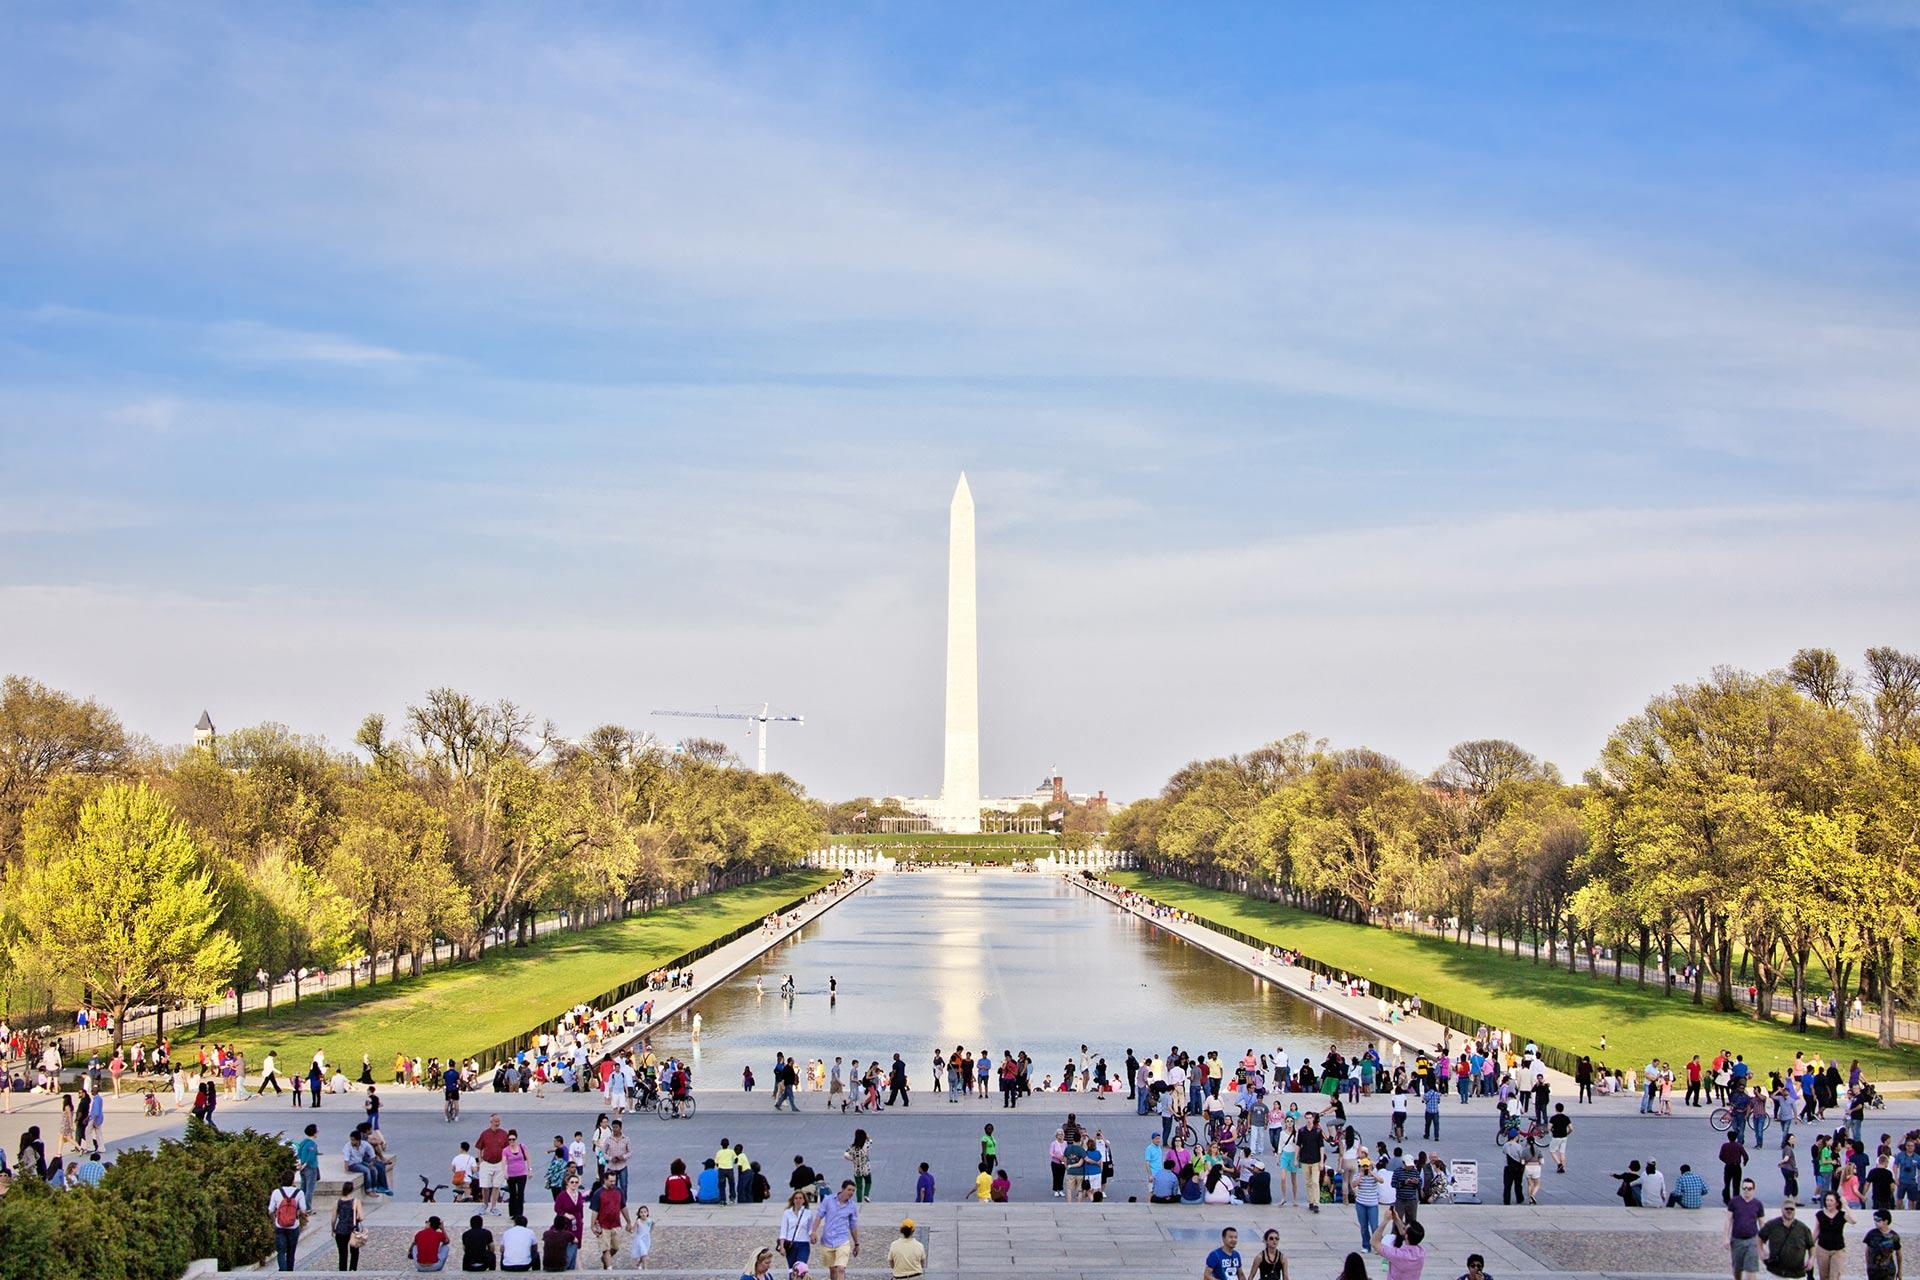 National Mall in Washington D.C.